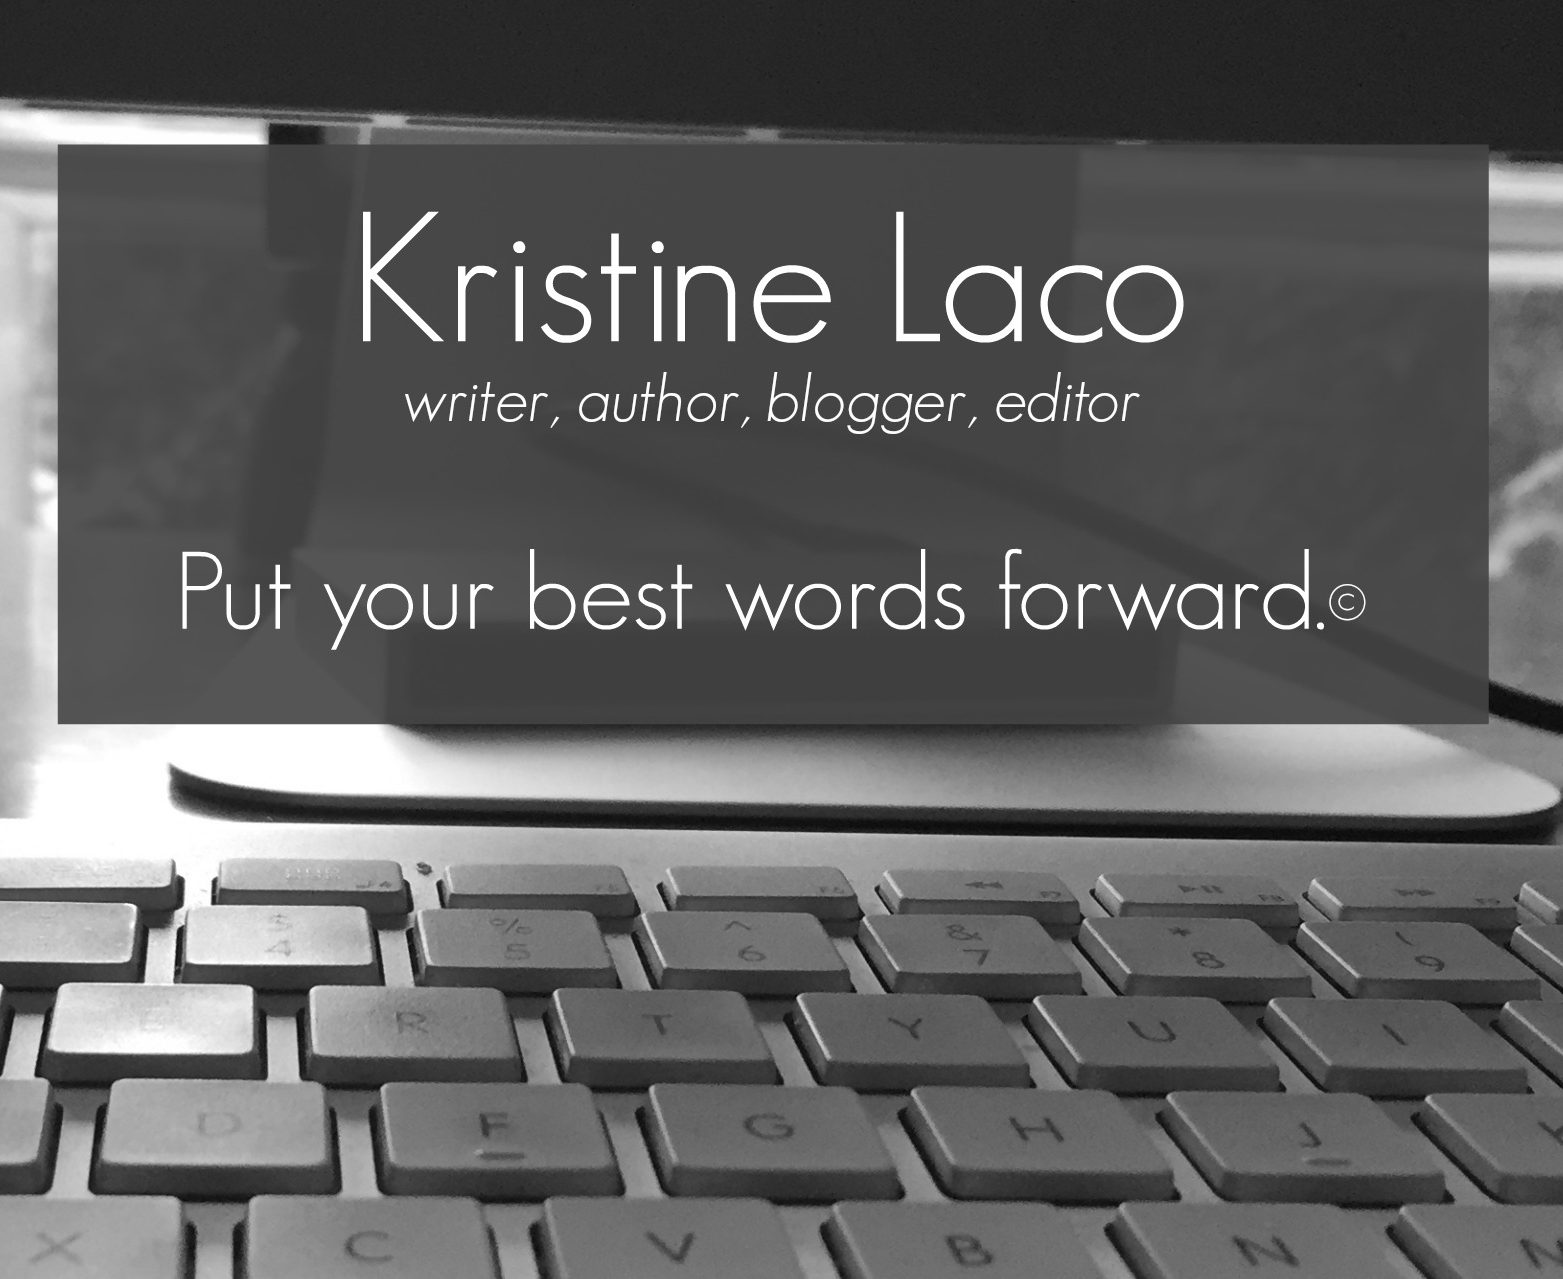 Kristine Laco